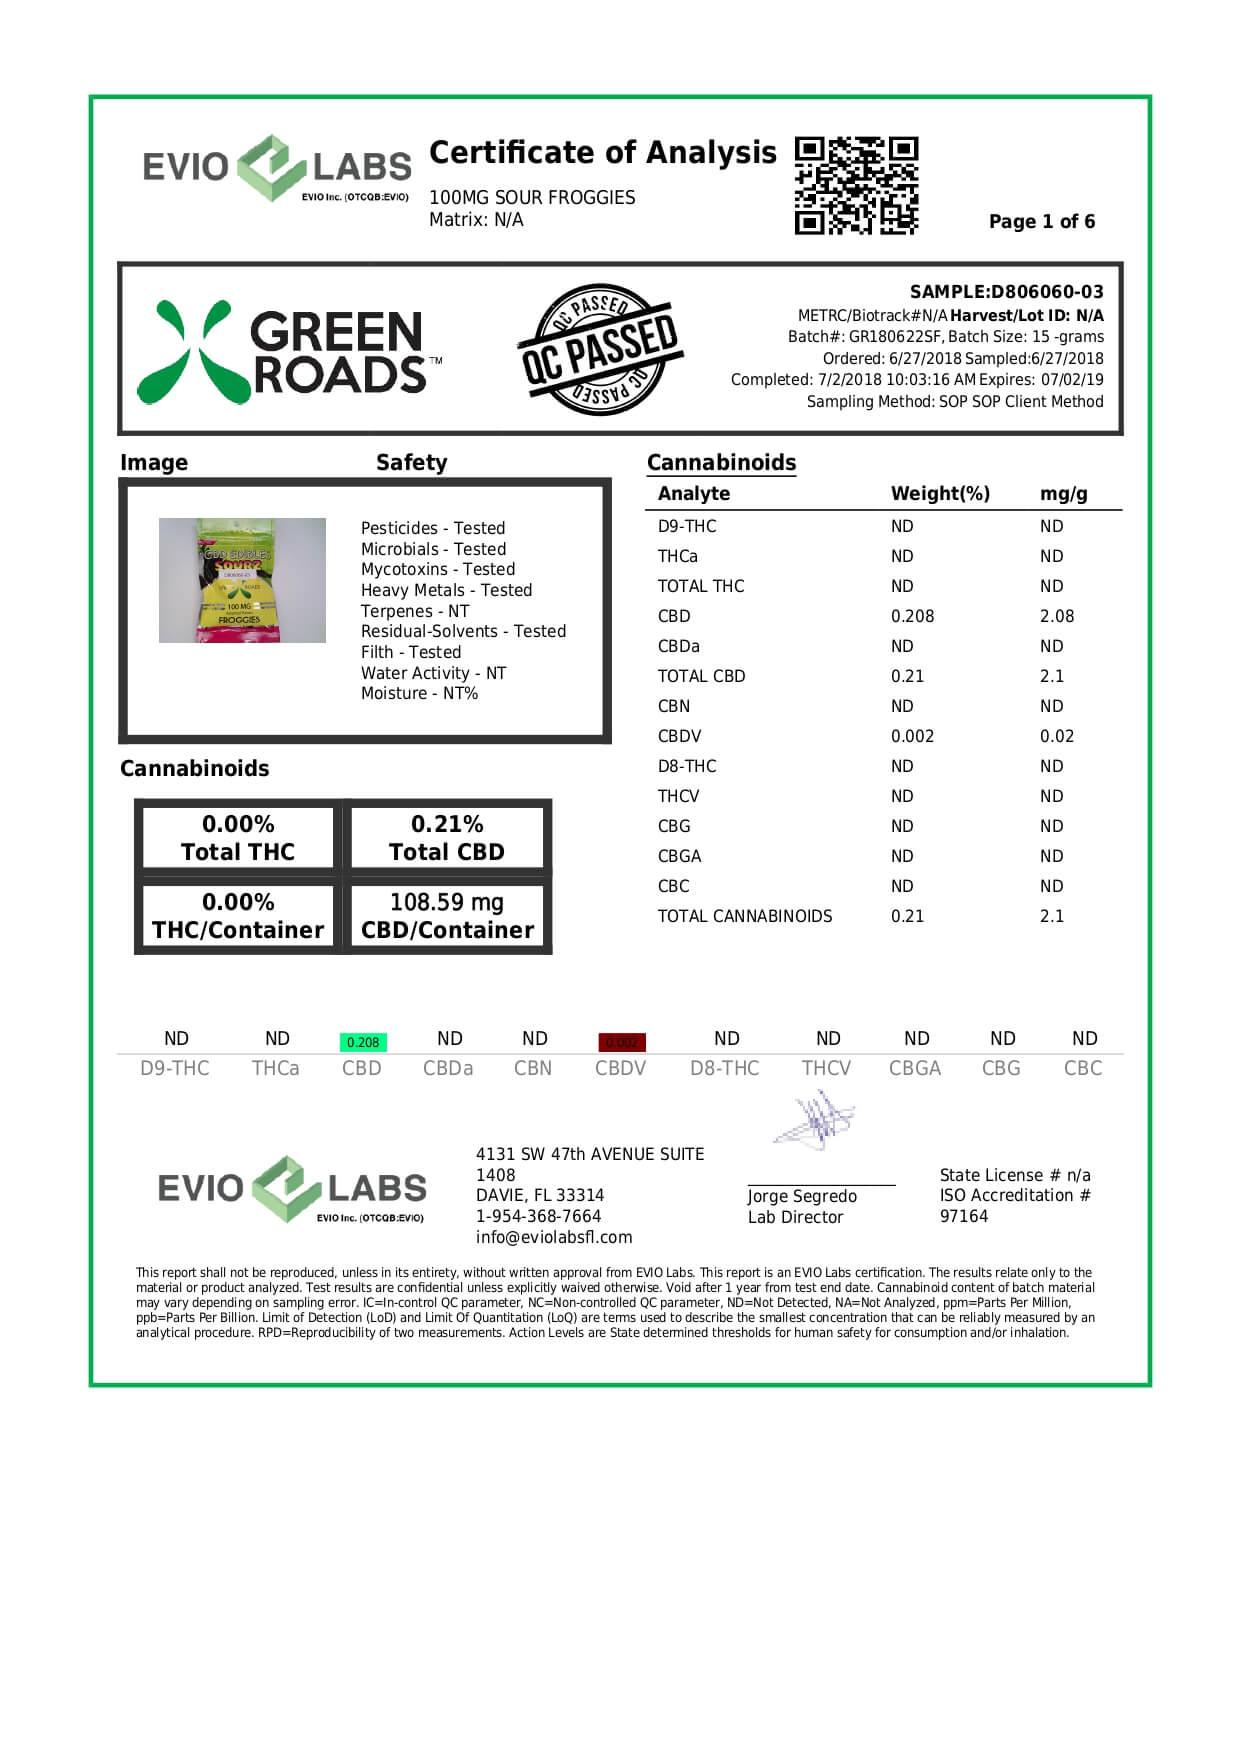 Green Roads CBD Edible Froggies SOURZ 100mg Lab Report